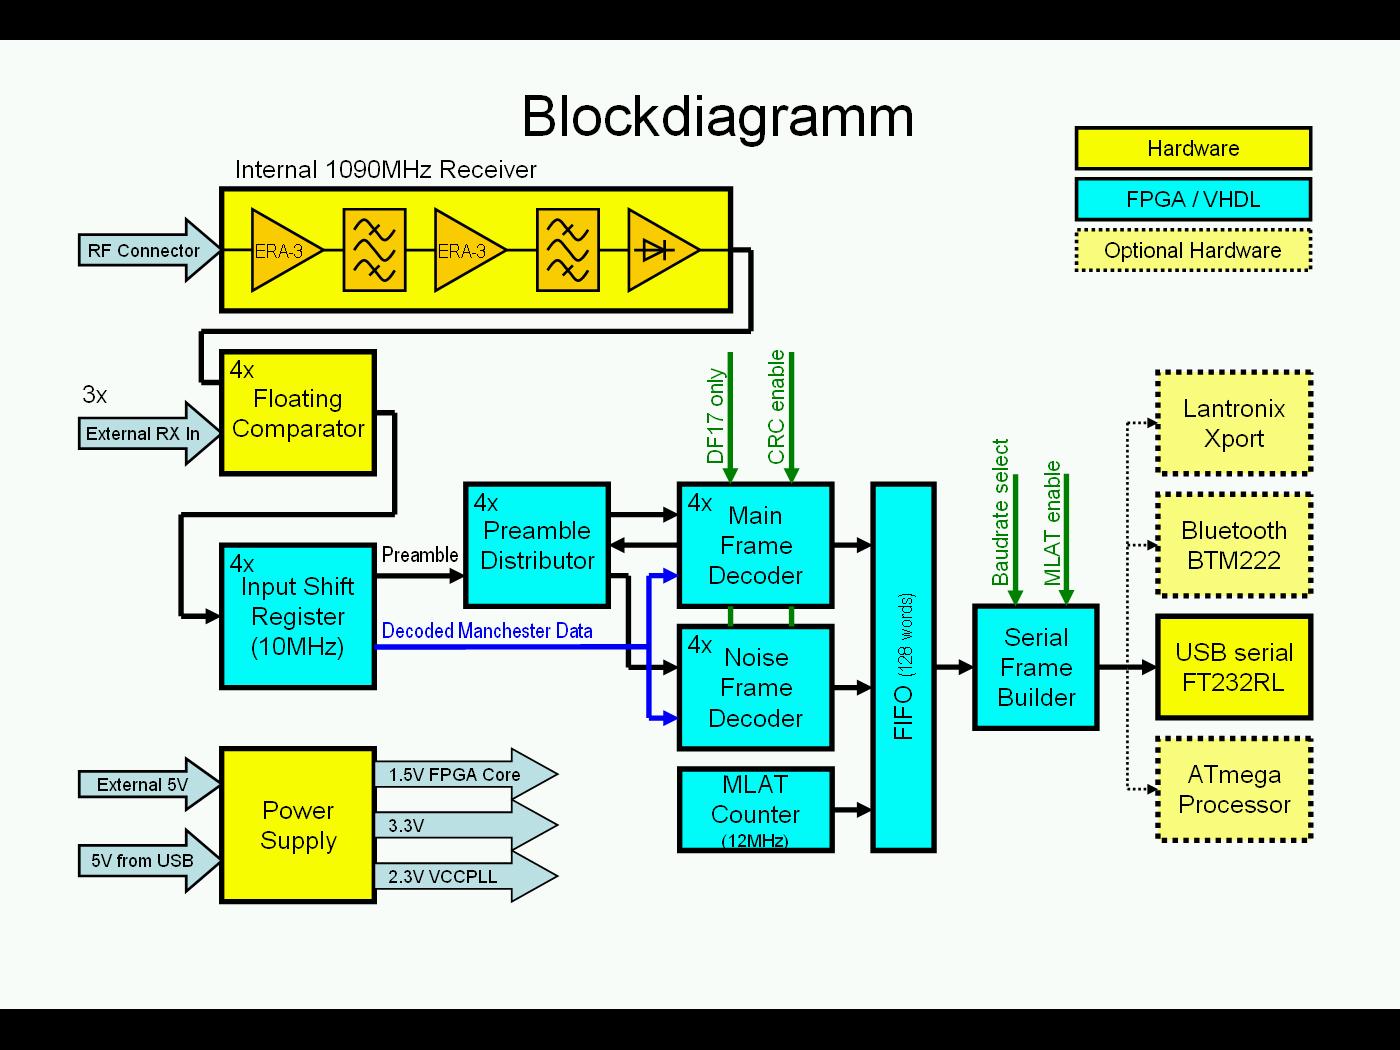 t v block diagram delta v block diagram fpgaadsb - a fpga based decoder including one miniadsb+ ...